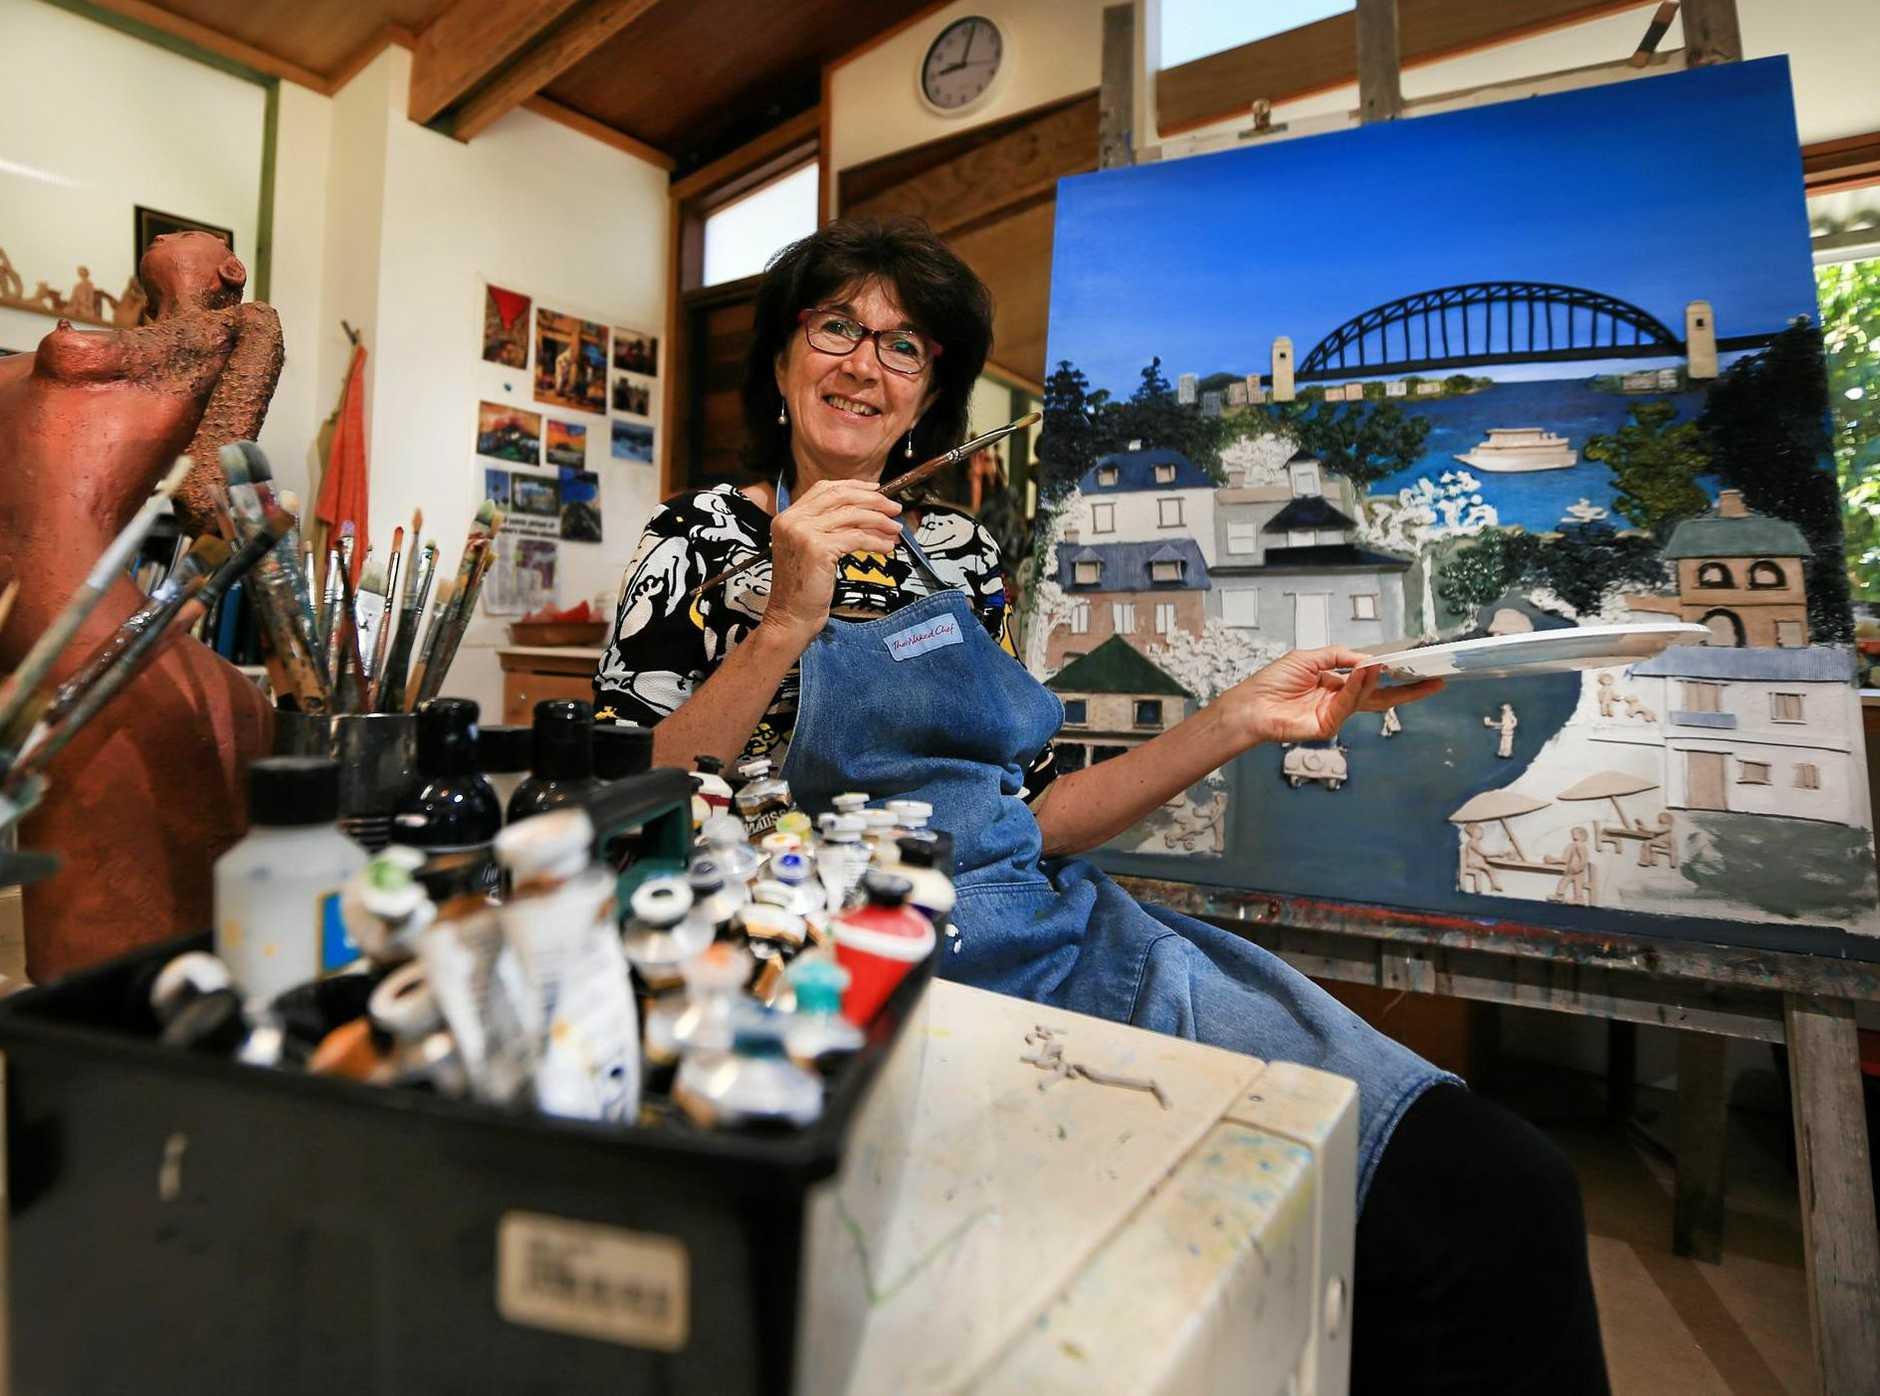 SERENE IMAGE: Sculpting artist Marie-Frace Rose prepares her Uki studio for Tweed Fusion Festival.